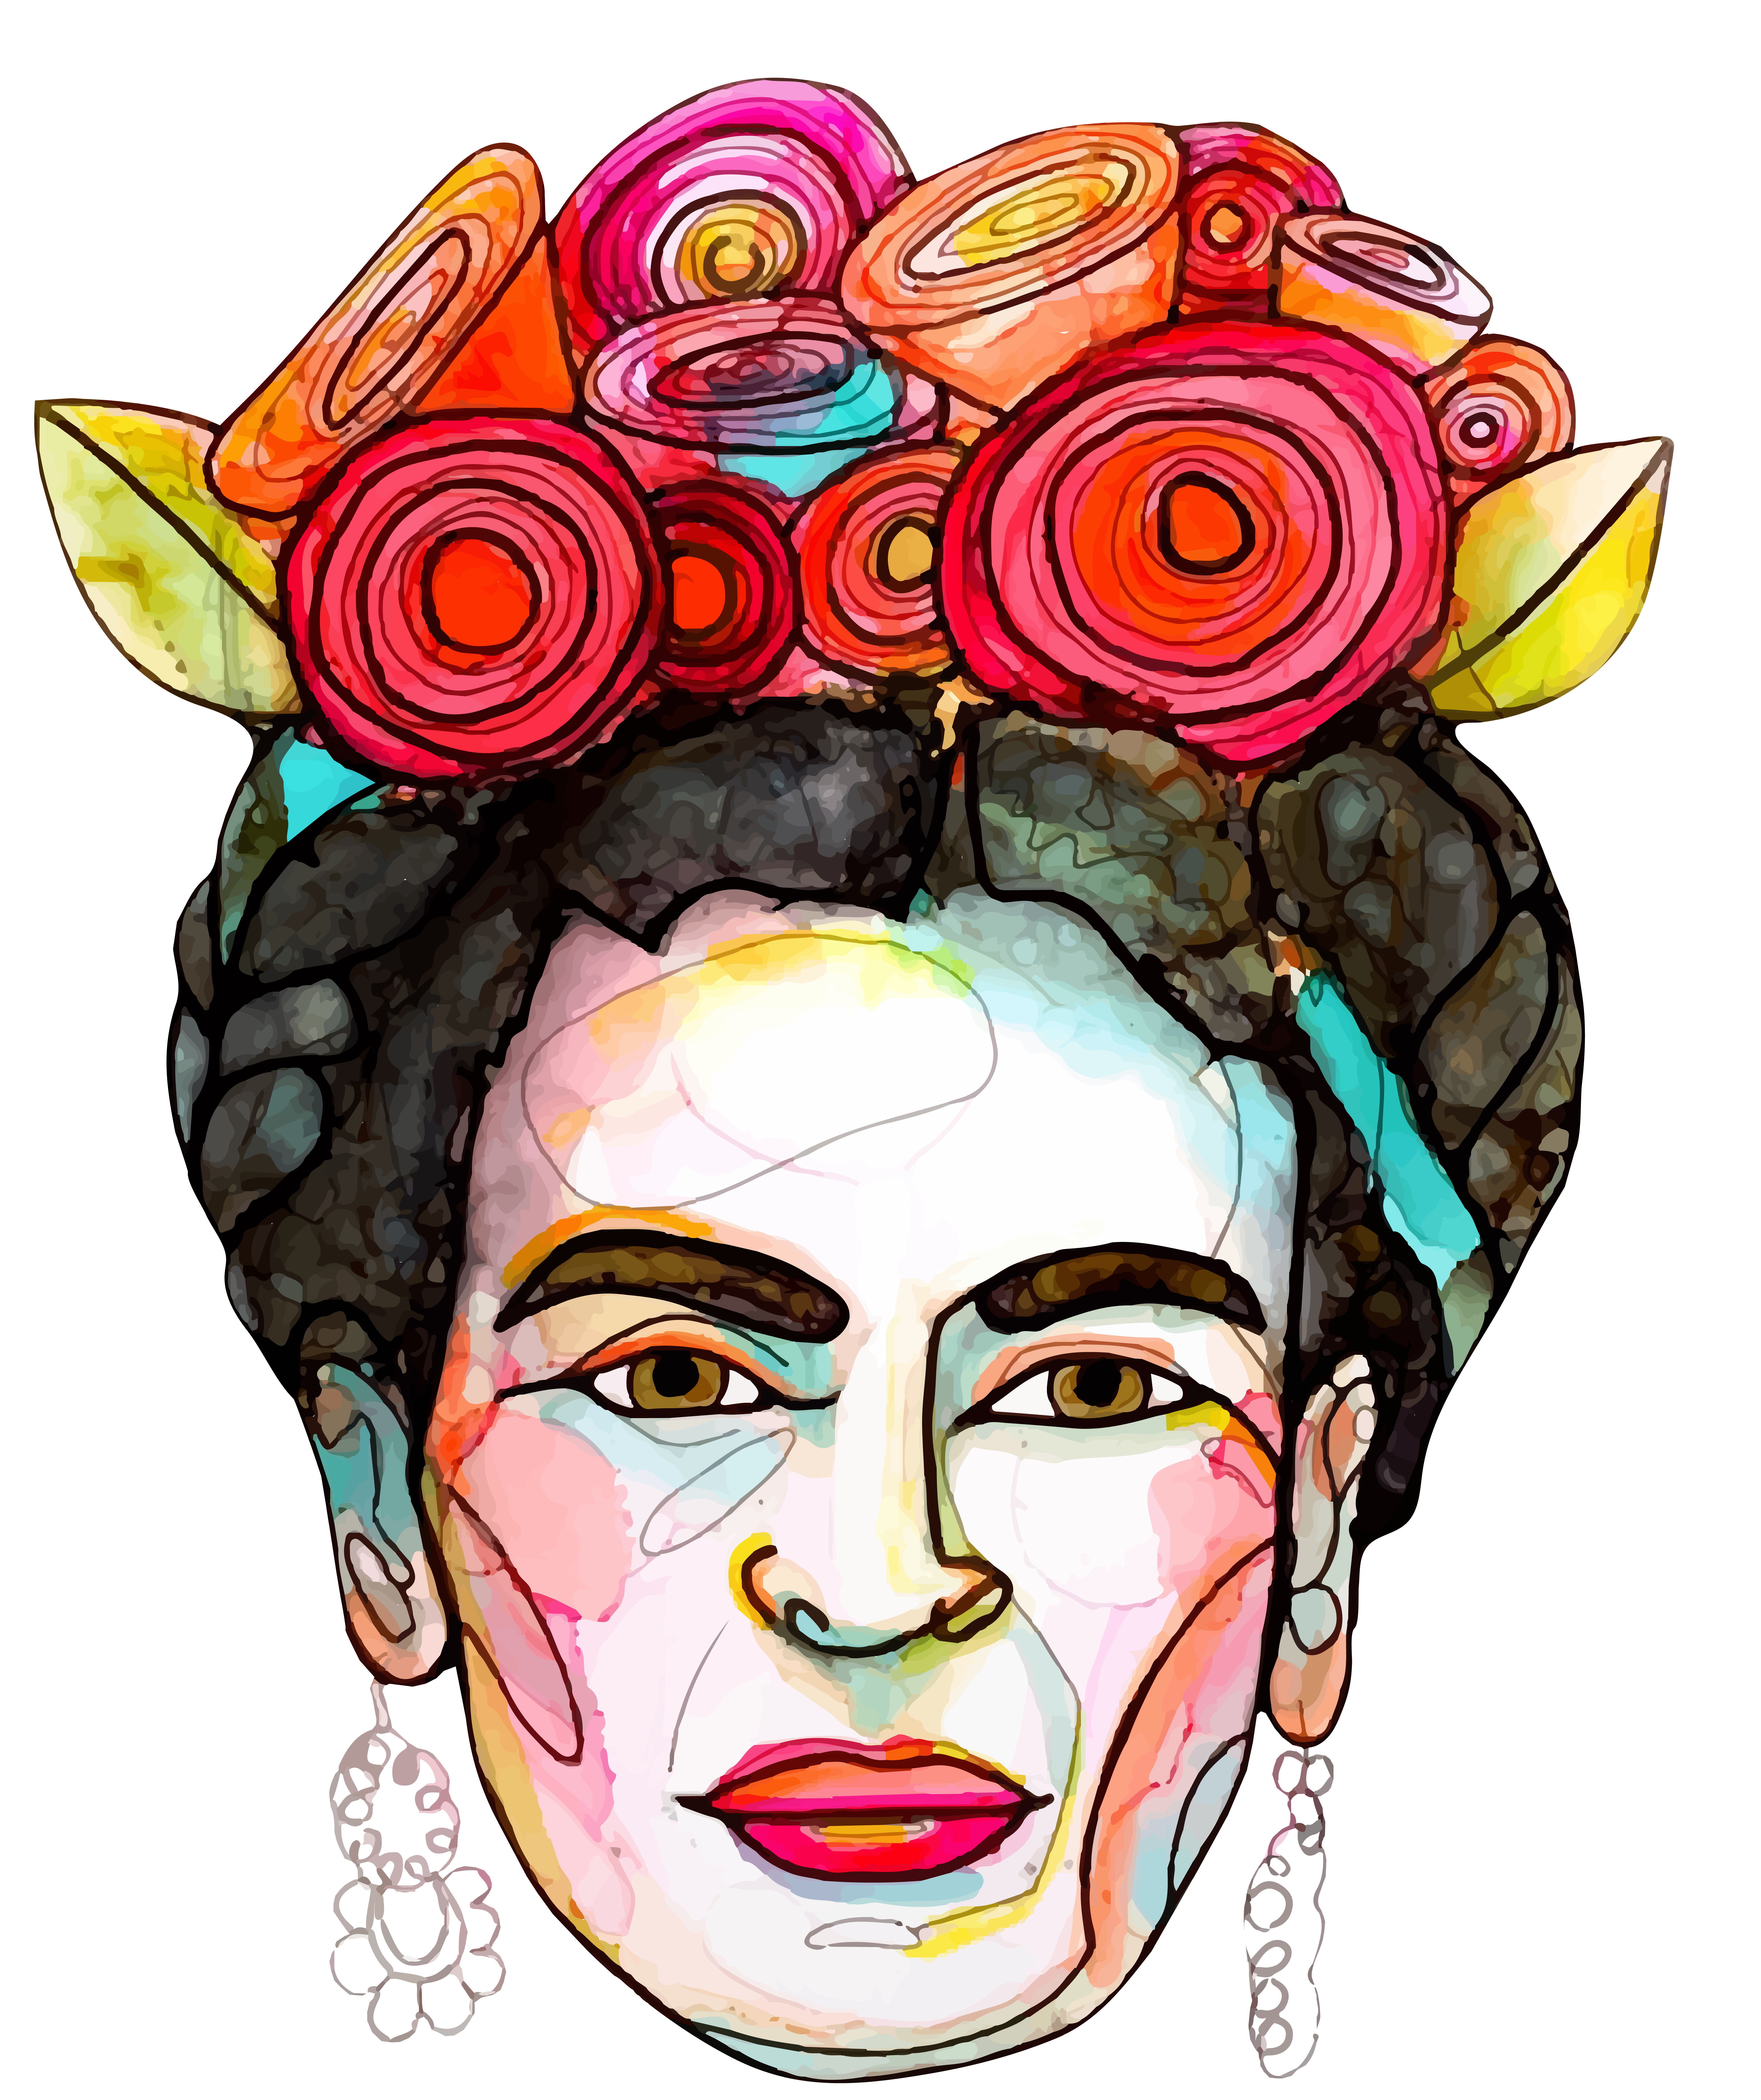 Frida Kahlo Art in 2020   Art, Frida kahlo art, Frida kahlo